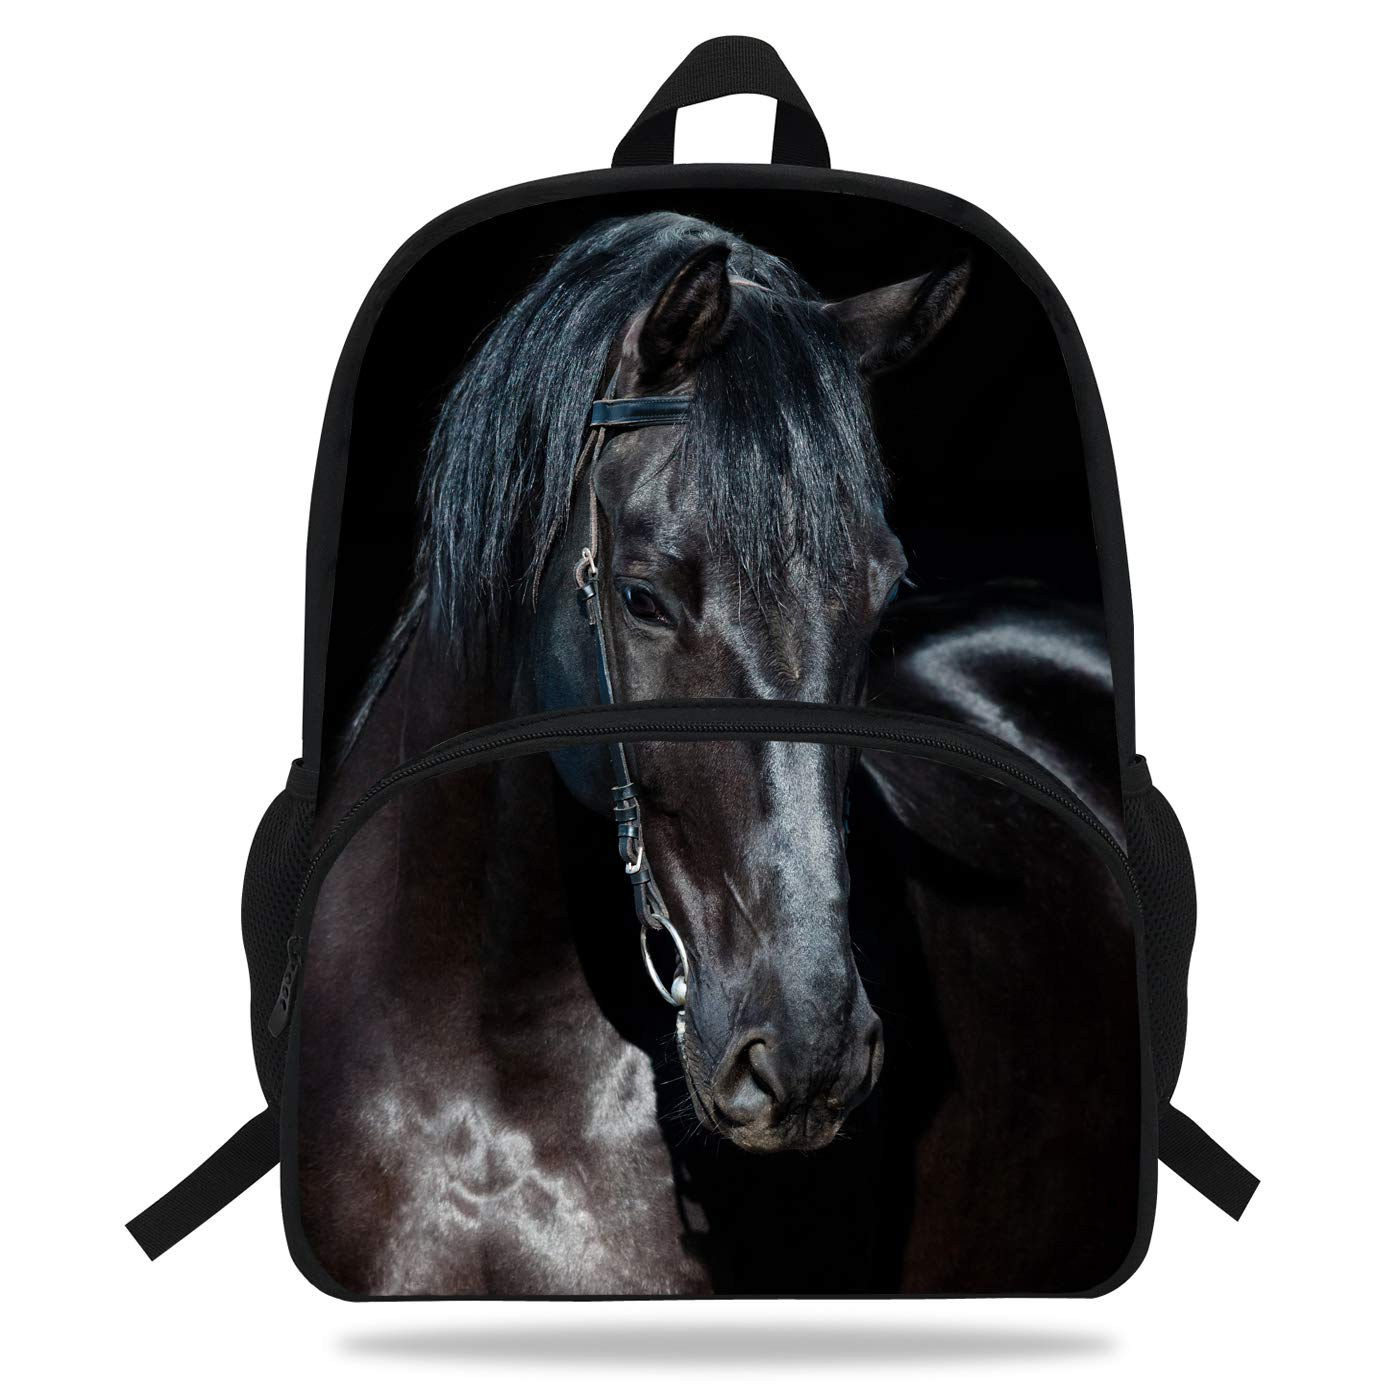 VEEWOW 16-Inch Popular Boys Girls Print Bag Horse Backpack For Kids School D1085